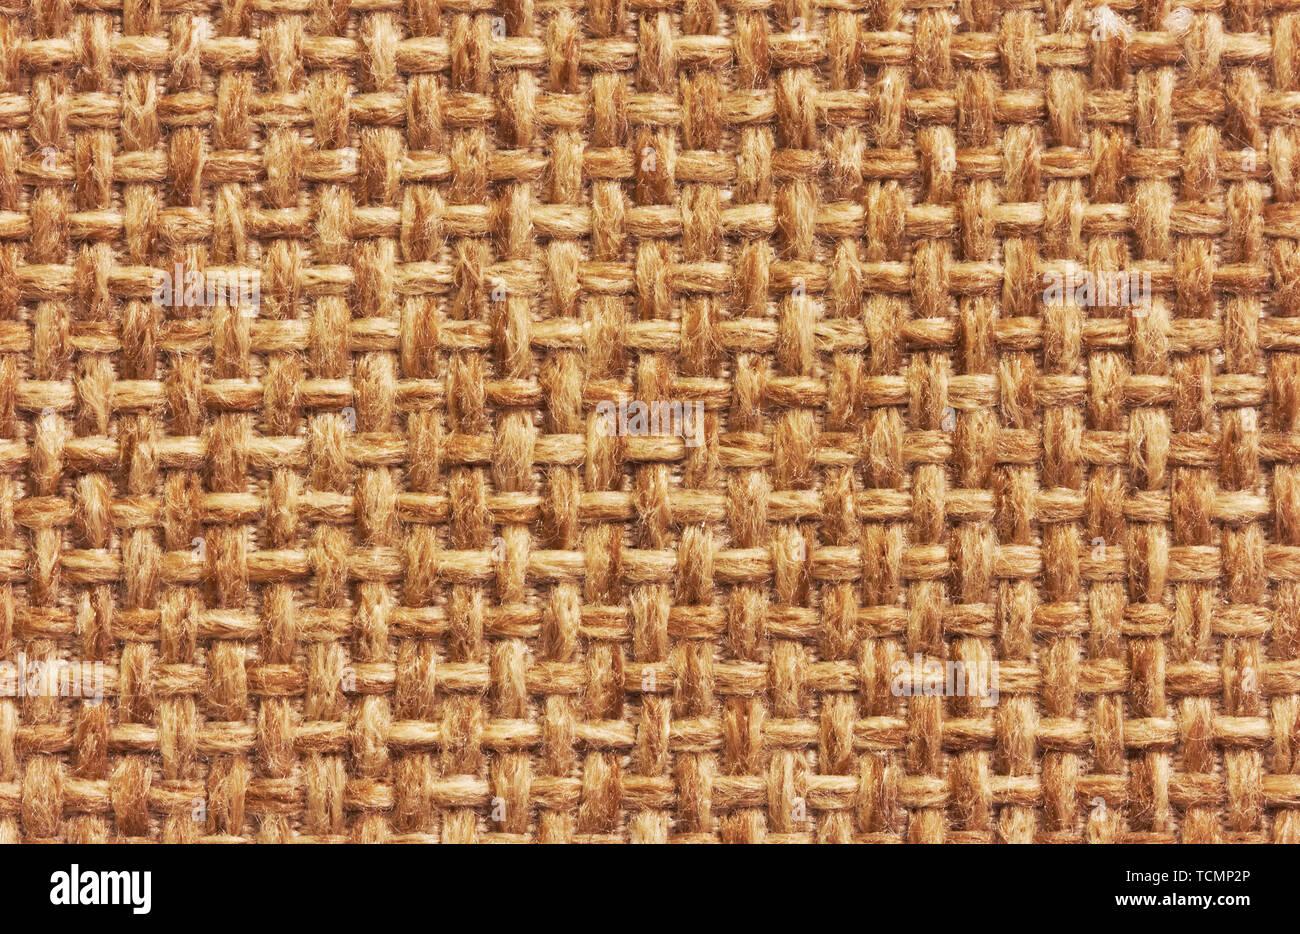 Natural burlap background, close up - Stock Image